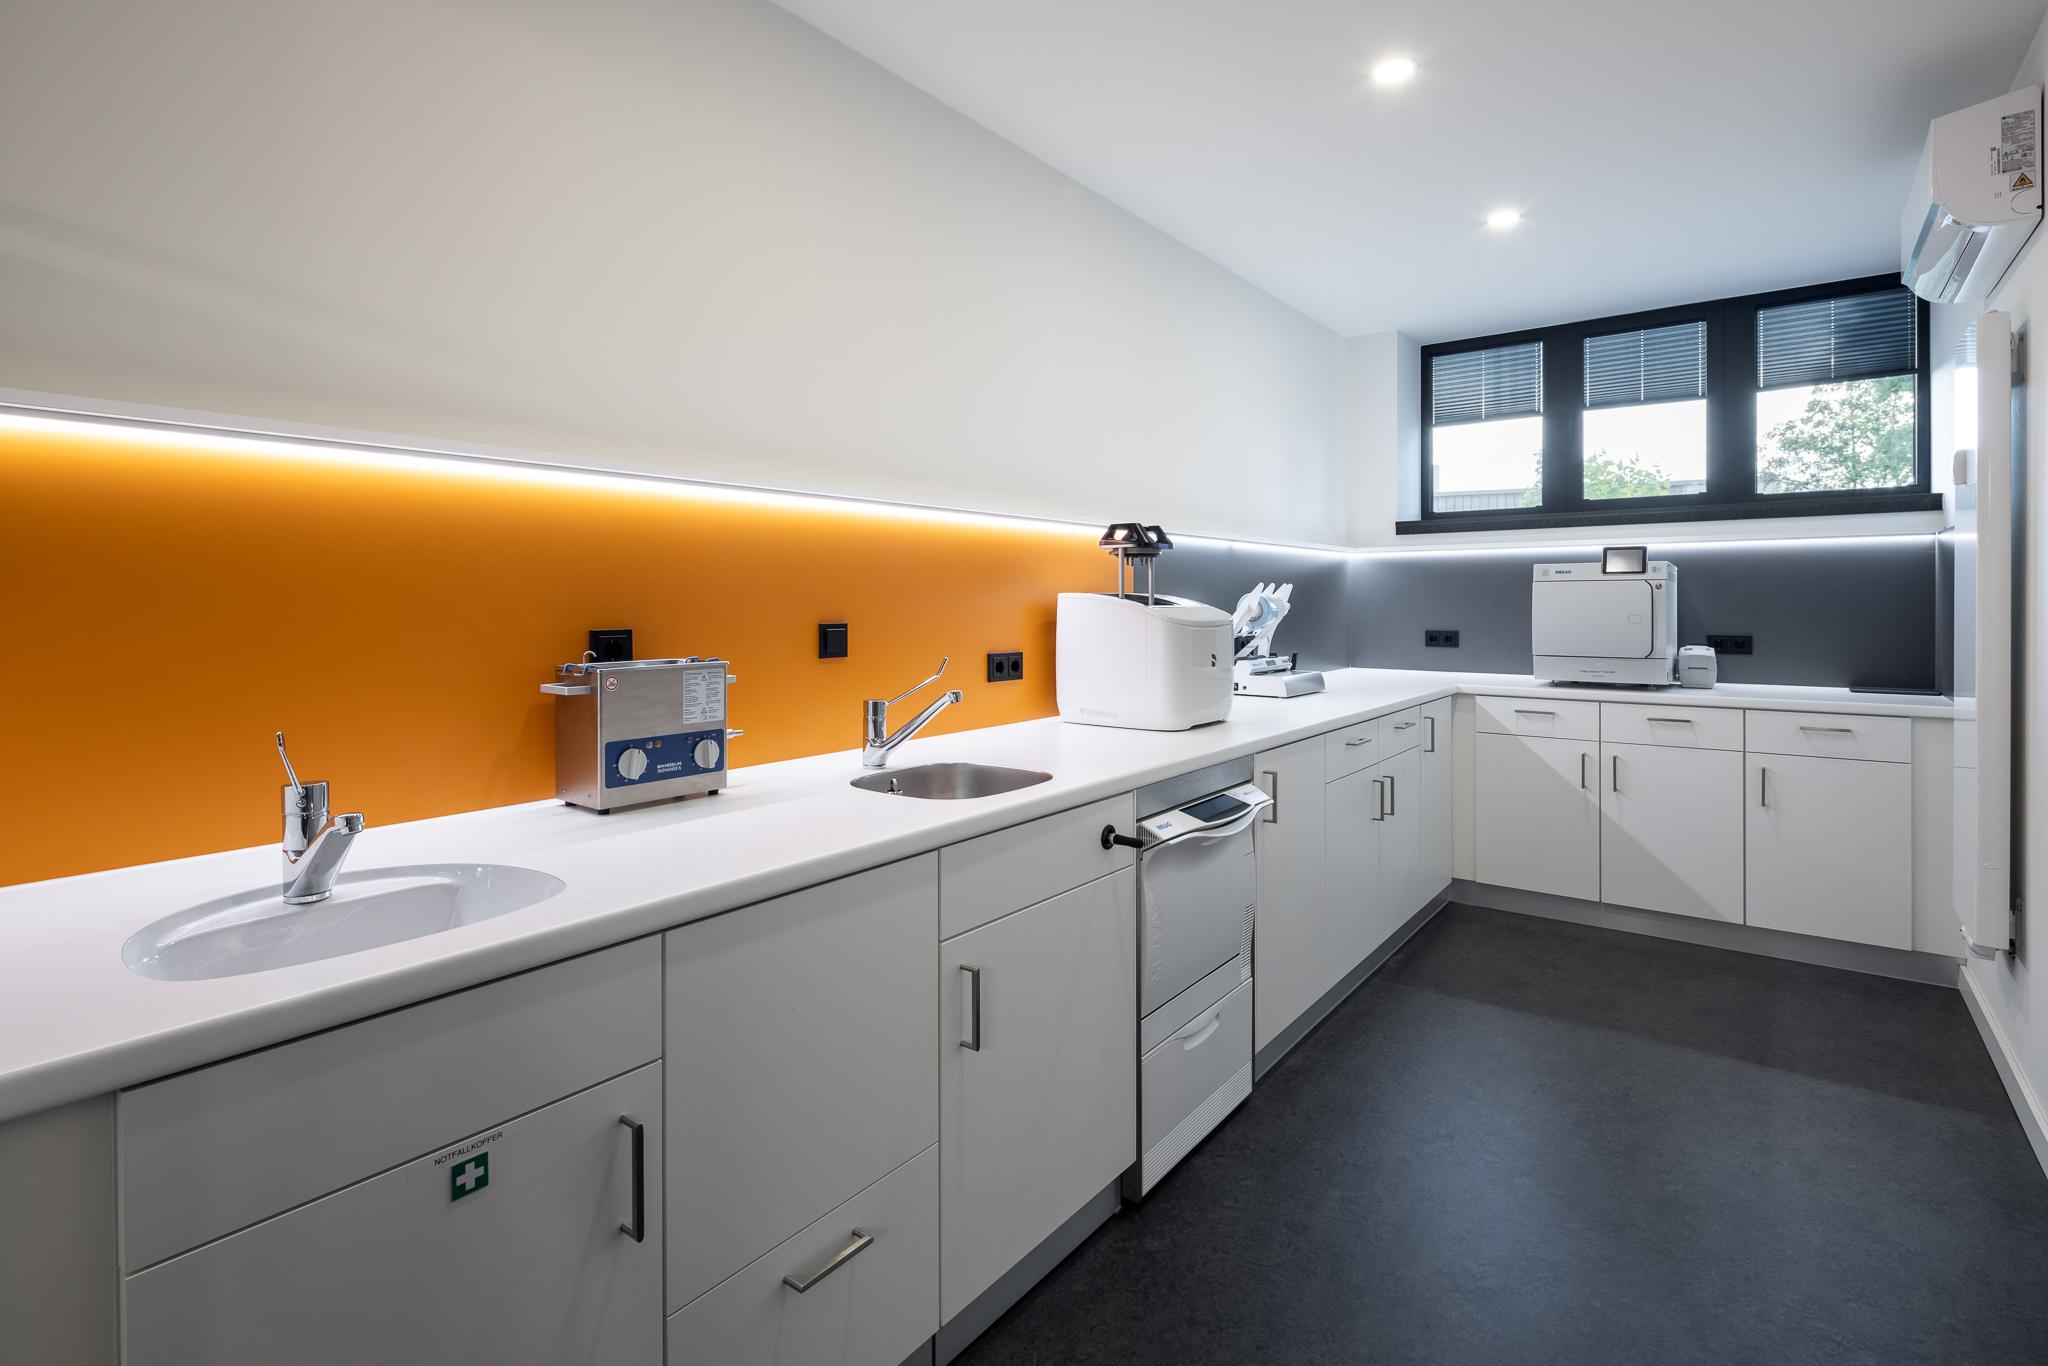 Zahnarzt Kassel Vorbereitung IDent